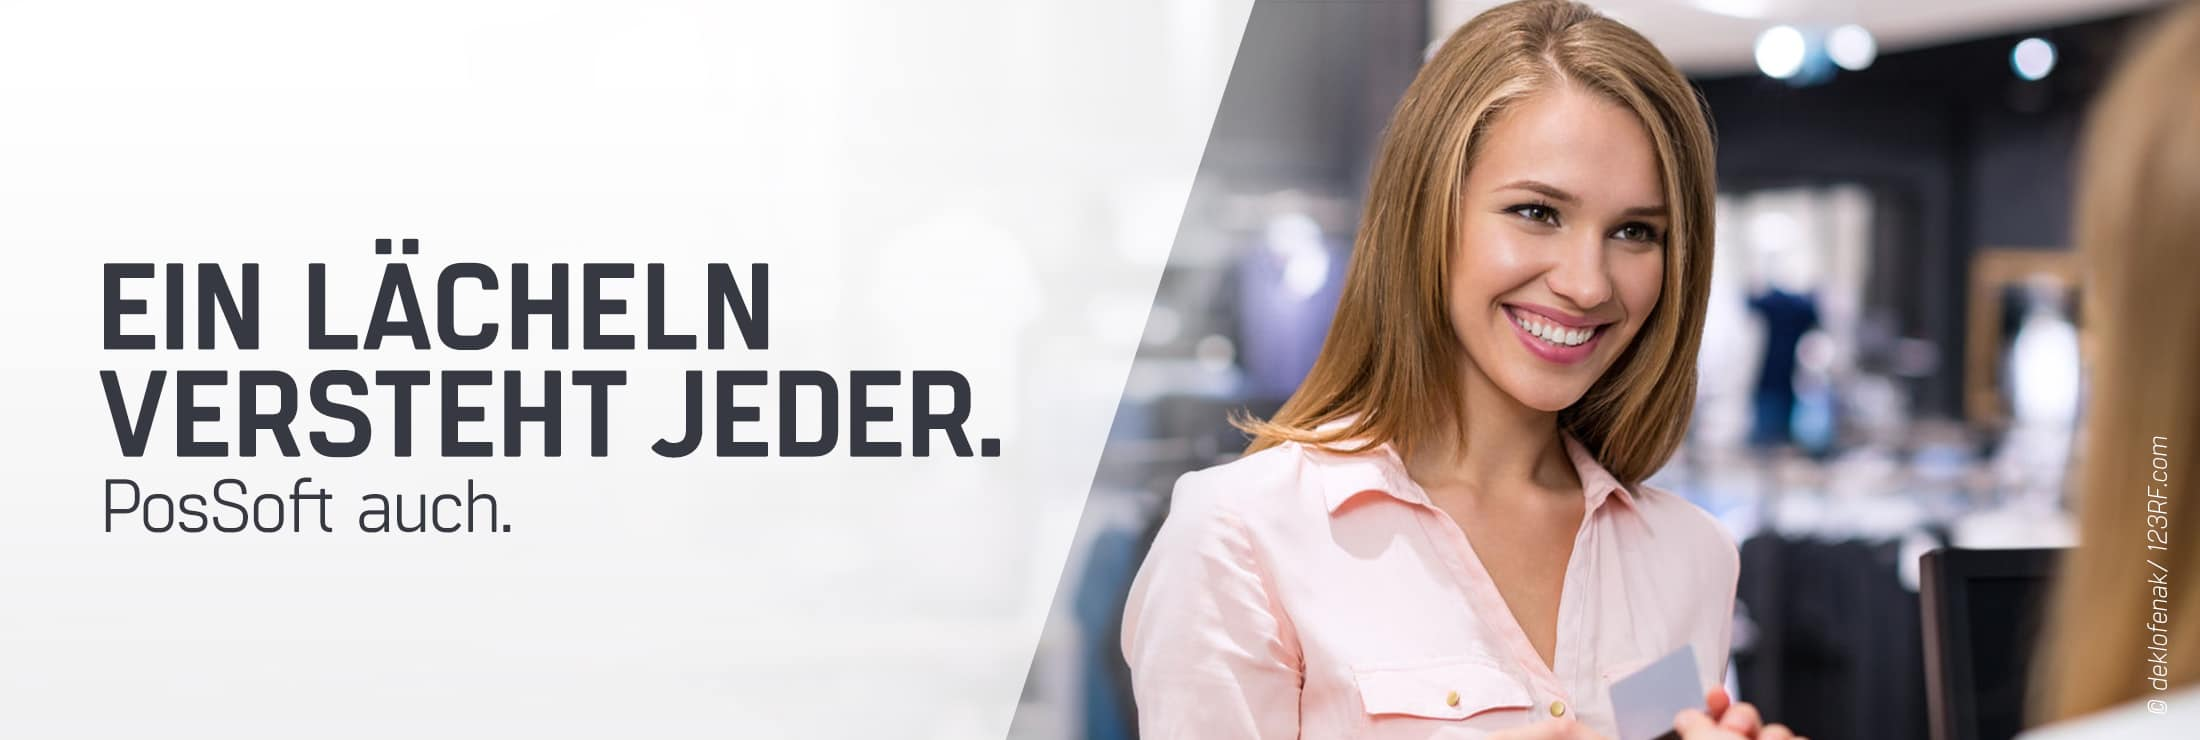 Blonde Frau am bezahlen mit Karte am PosSoft Kassensystem im Einzelhandel - TSE, Kassenhardware und Einzelhandel Kassensoftware